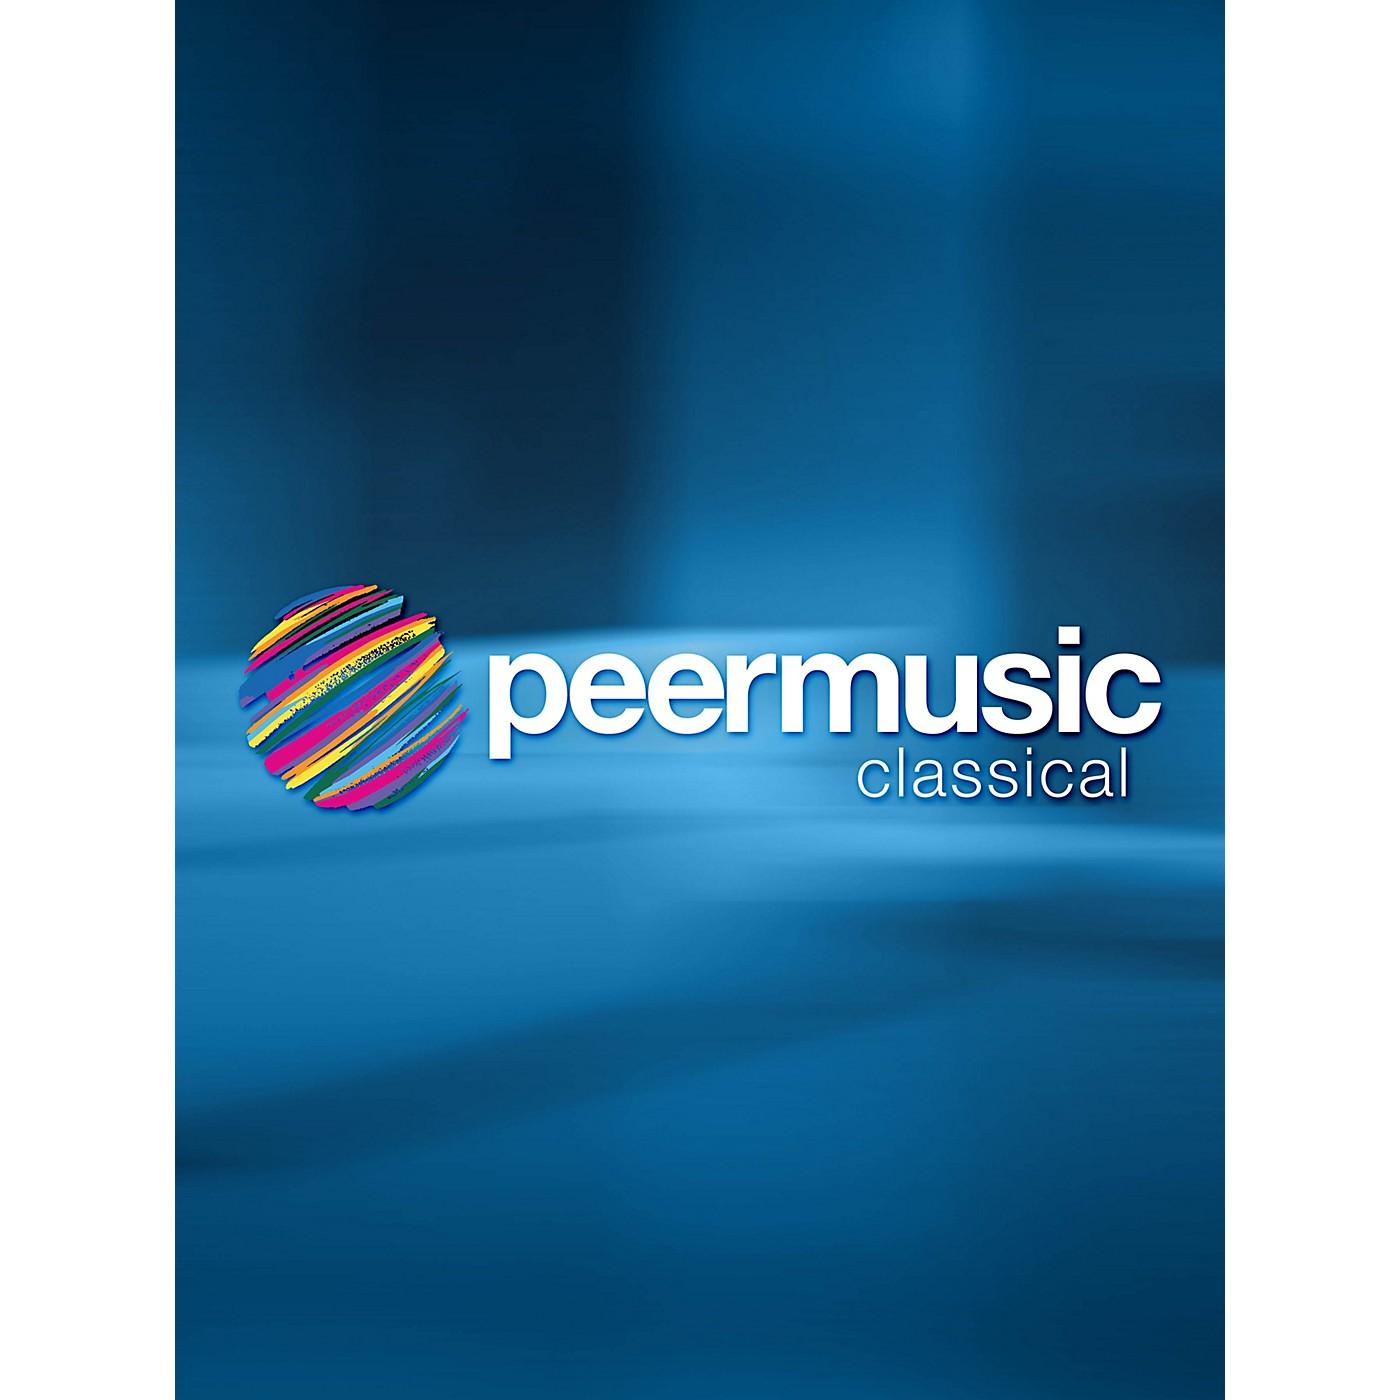 Peer Music 3 Poemas de Rainer María Rilke Peermusic Classical Series Composed by Richard Engelbrecht thumbnail